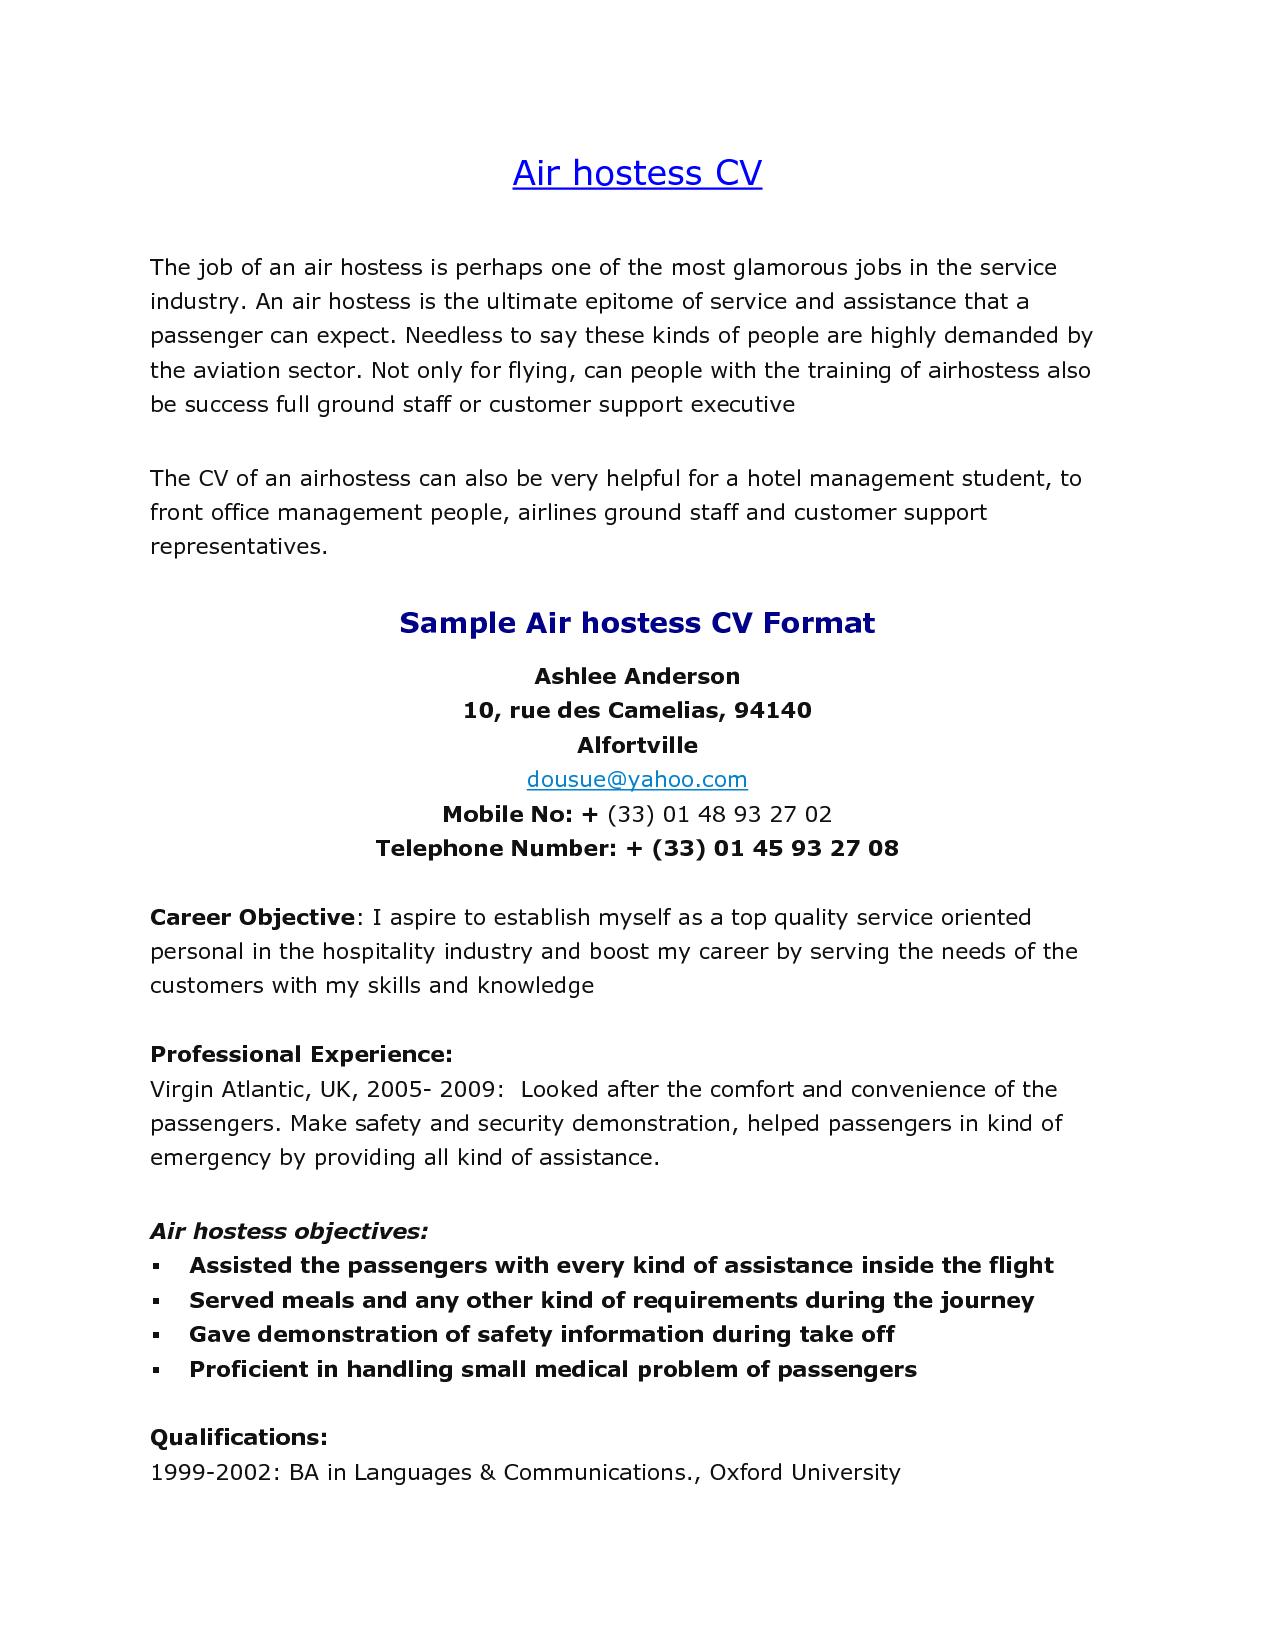 Sample Resume For Aviation Industry Job Resume Examples Job Resume Samples Resume Examples